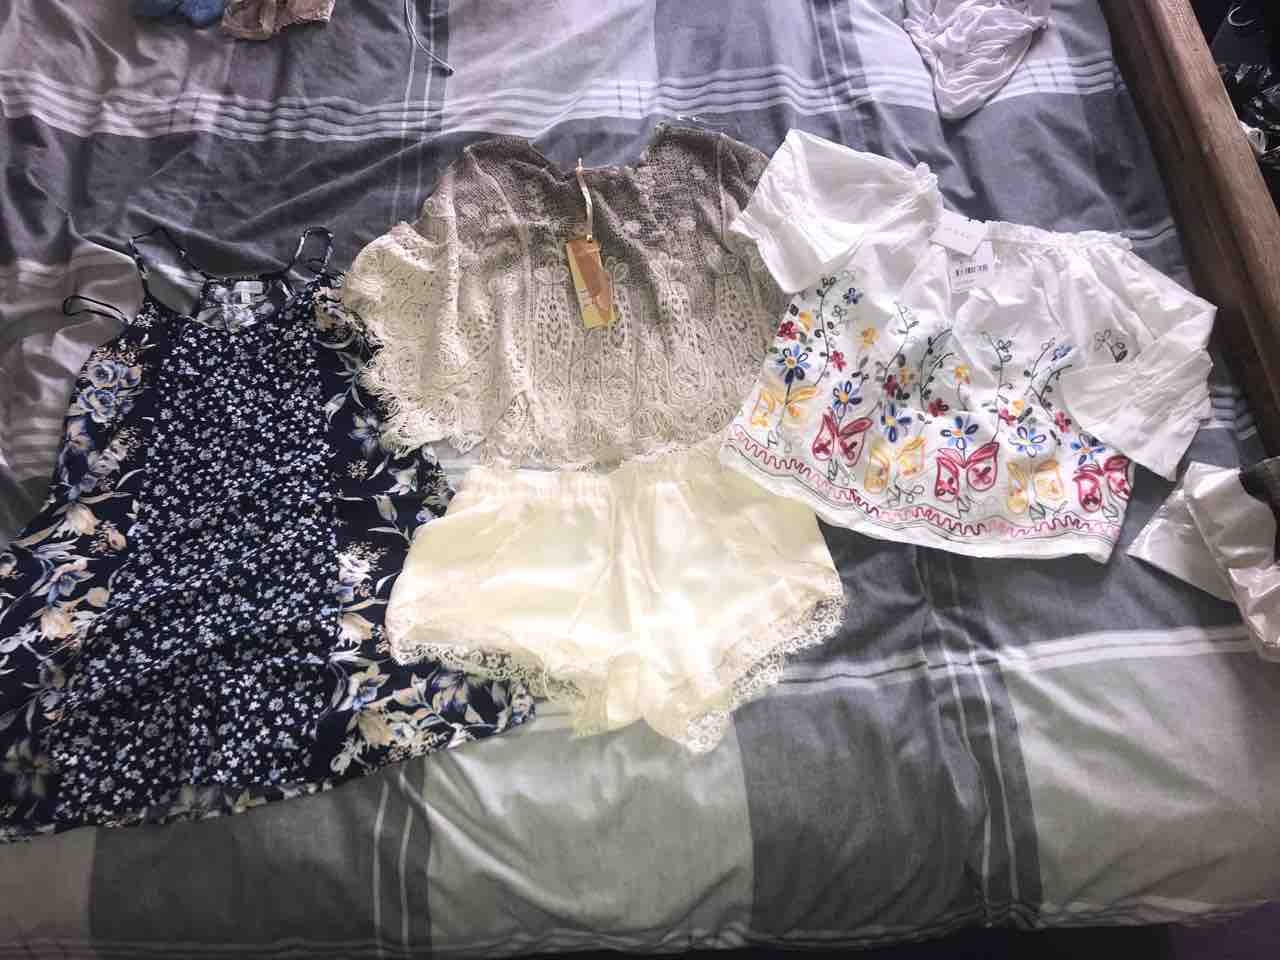 Bag of summer wear